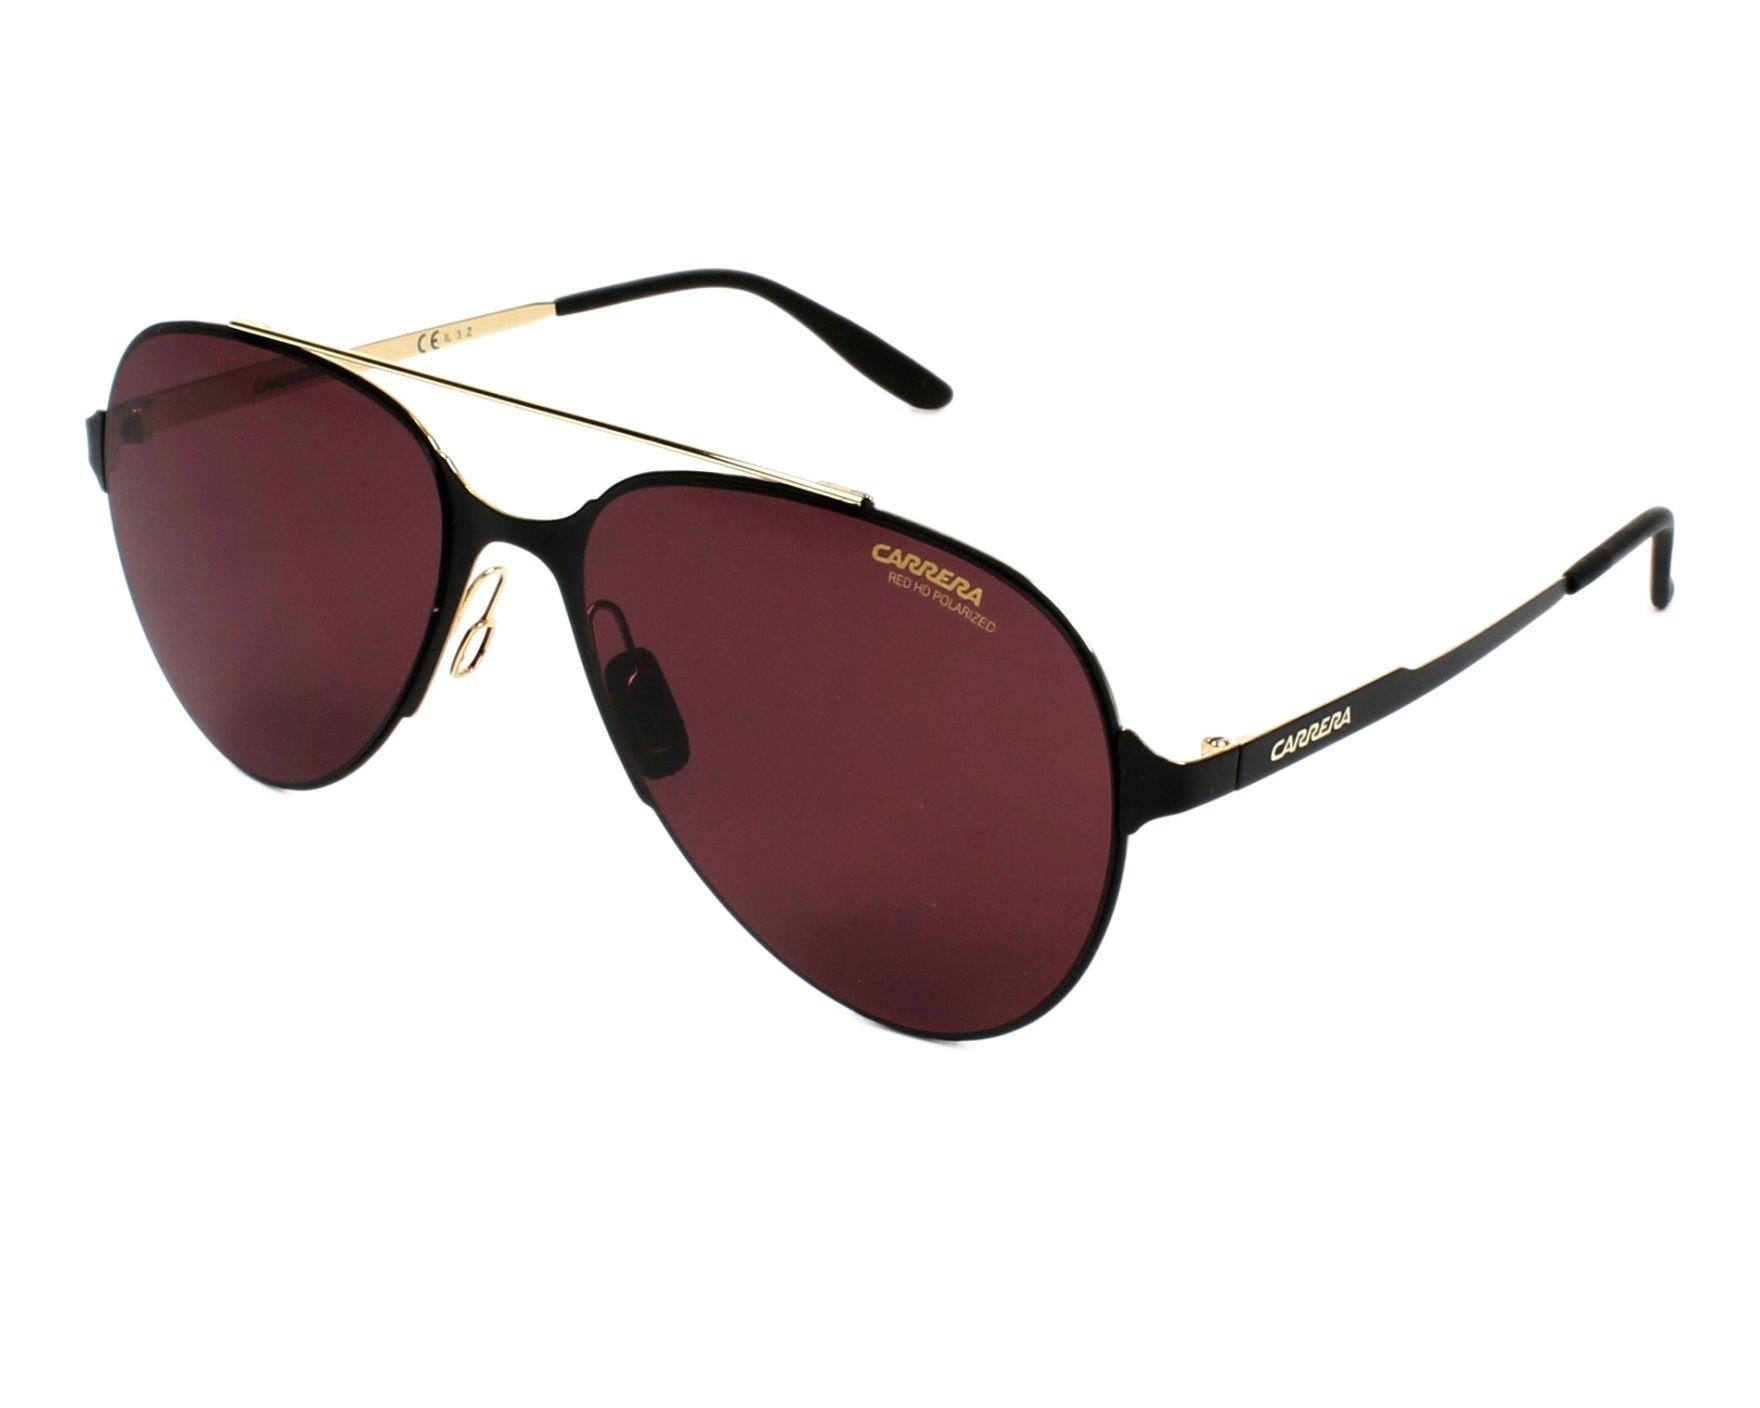 51dbb52af Polarized. Sunglasses Carrera CARRERA-113-S 1PW/W6 57-17 Black Gold profile